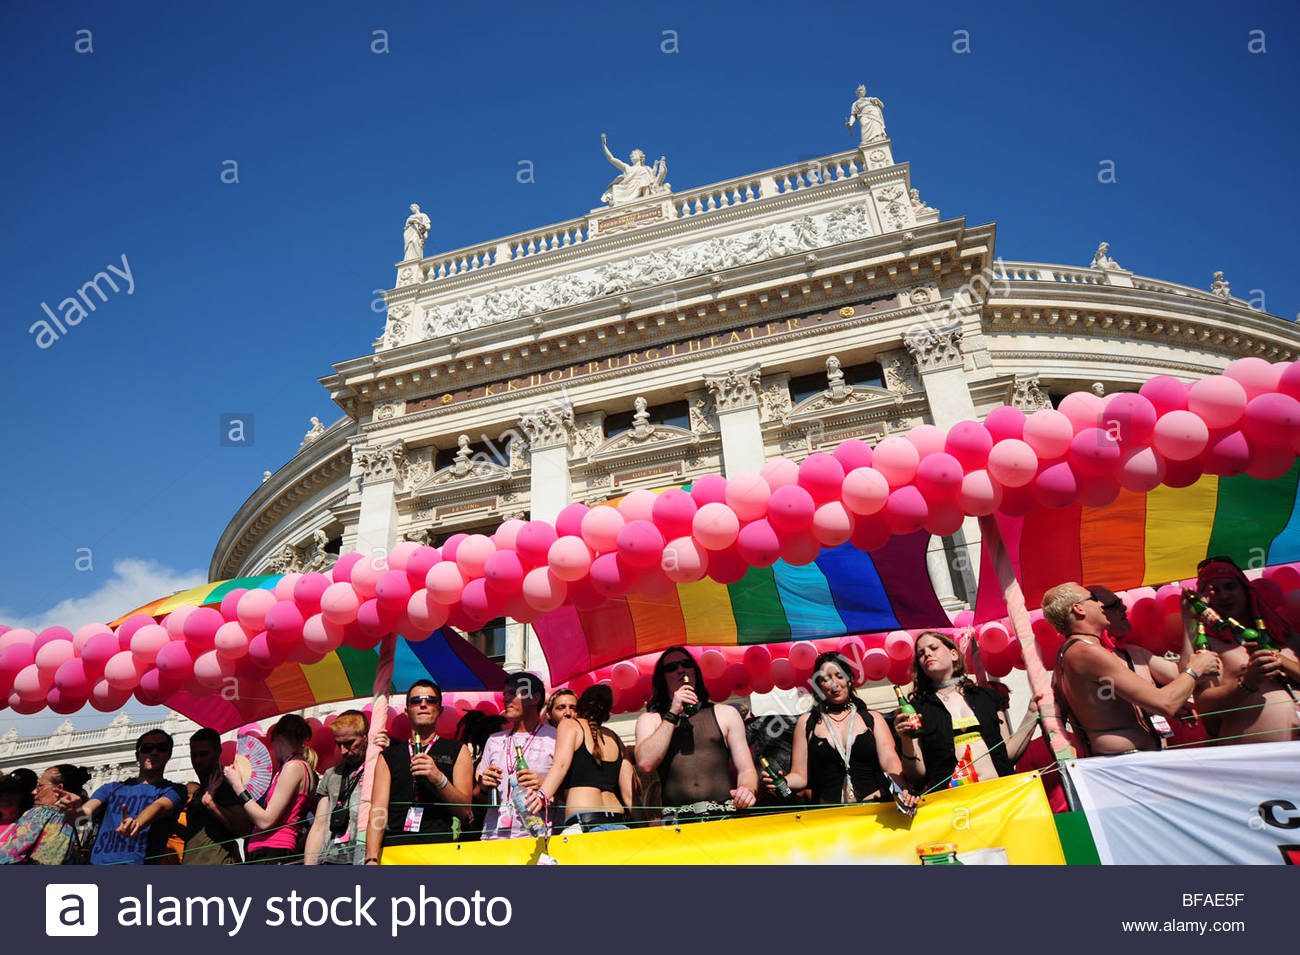 Wien, Regenbogenparade 2009 - Vienna, Rainbow Parade 2009 - Stock Image